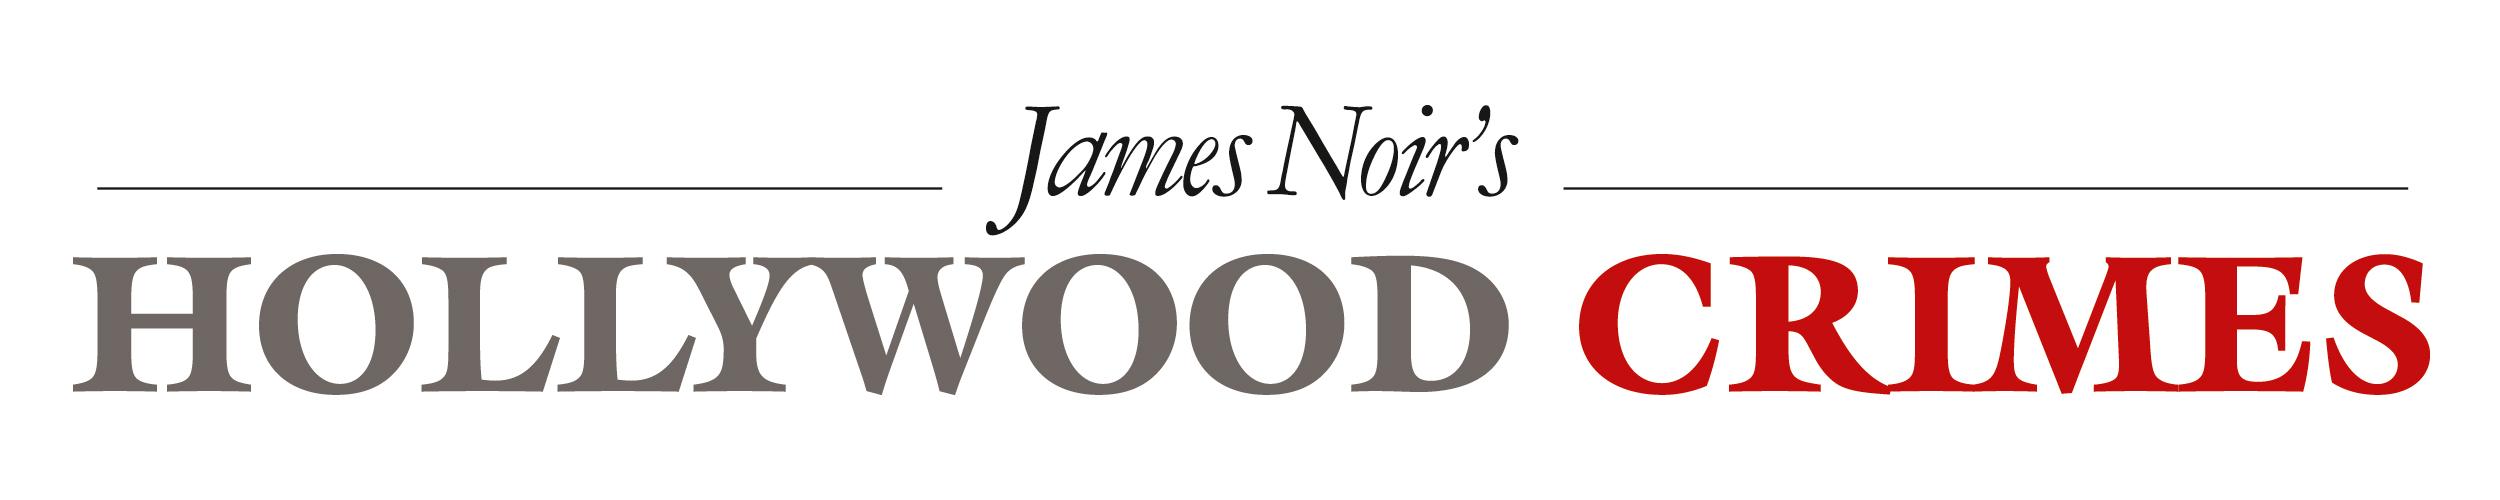 JamesNoir-sHollywoodCrimes 3DS Div 001